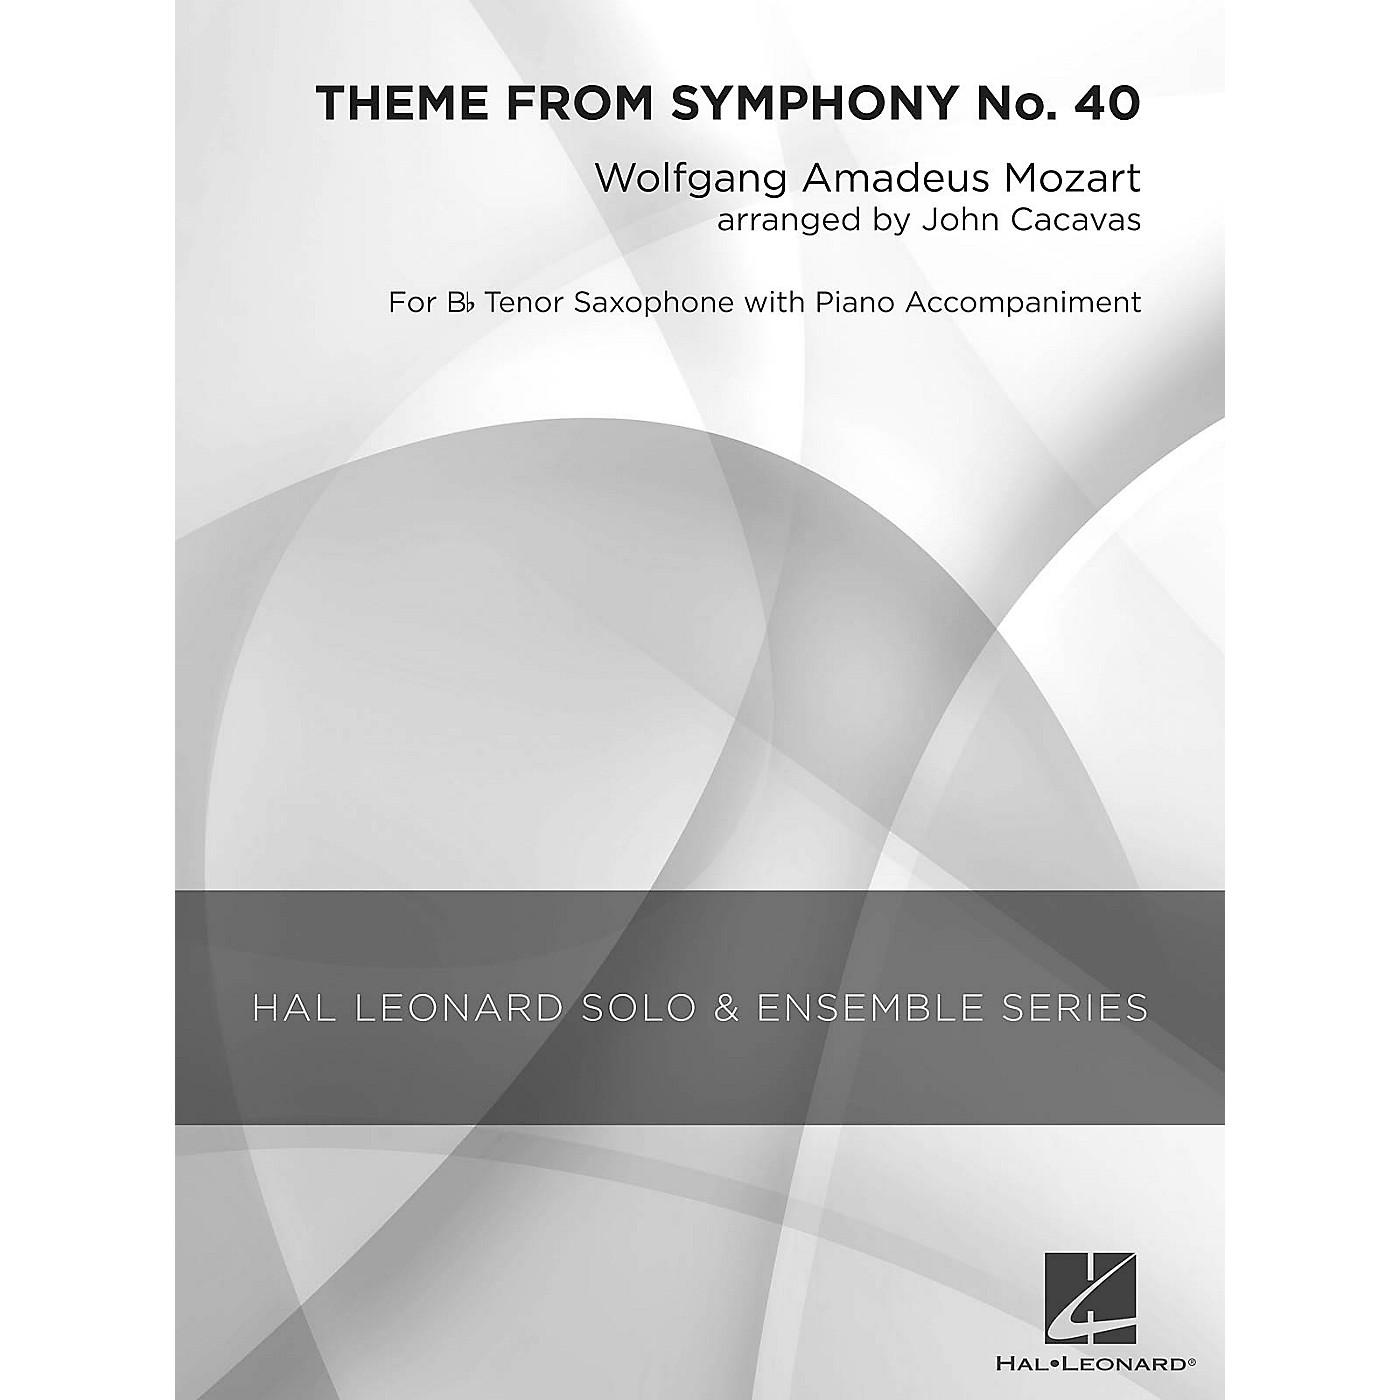 Hal Leonard Theme from Symphony No. 40 (Grade 3 Tenor Saxophone Solo) Concert Band Level 3 Arranged by John Cacavas thumbnail